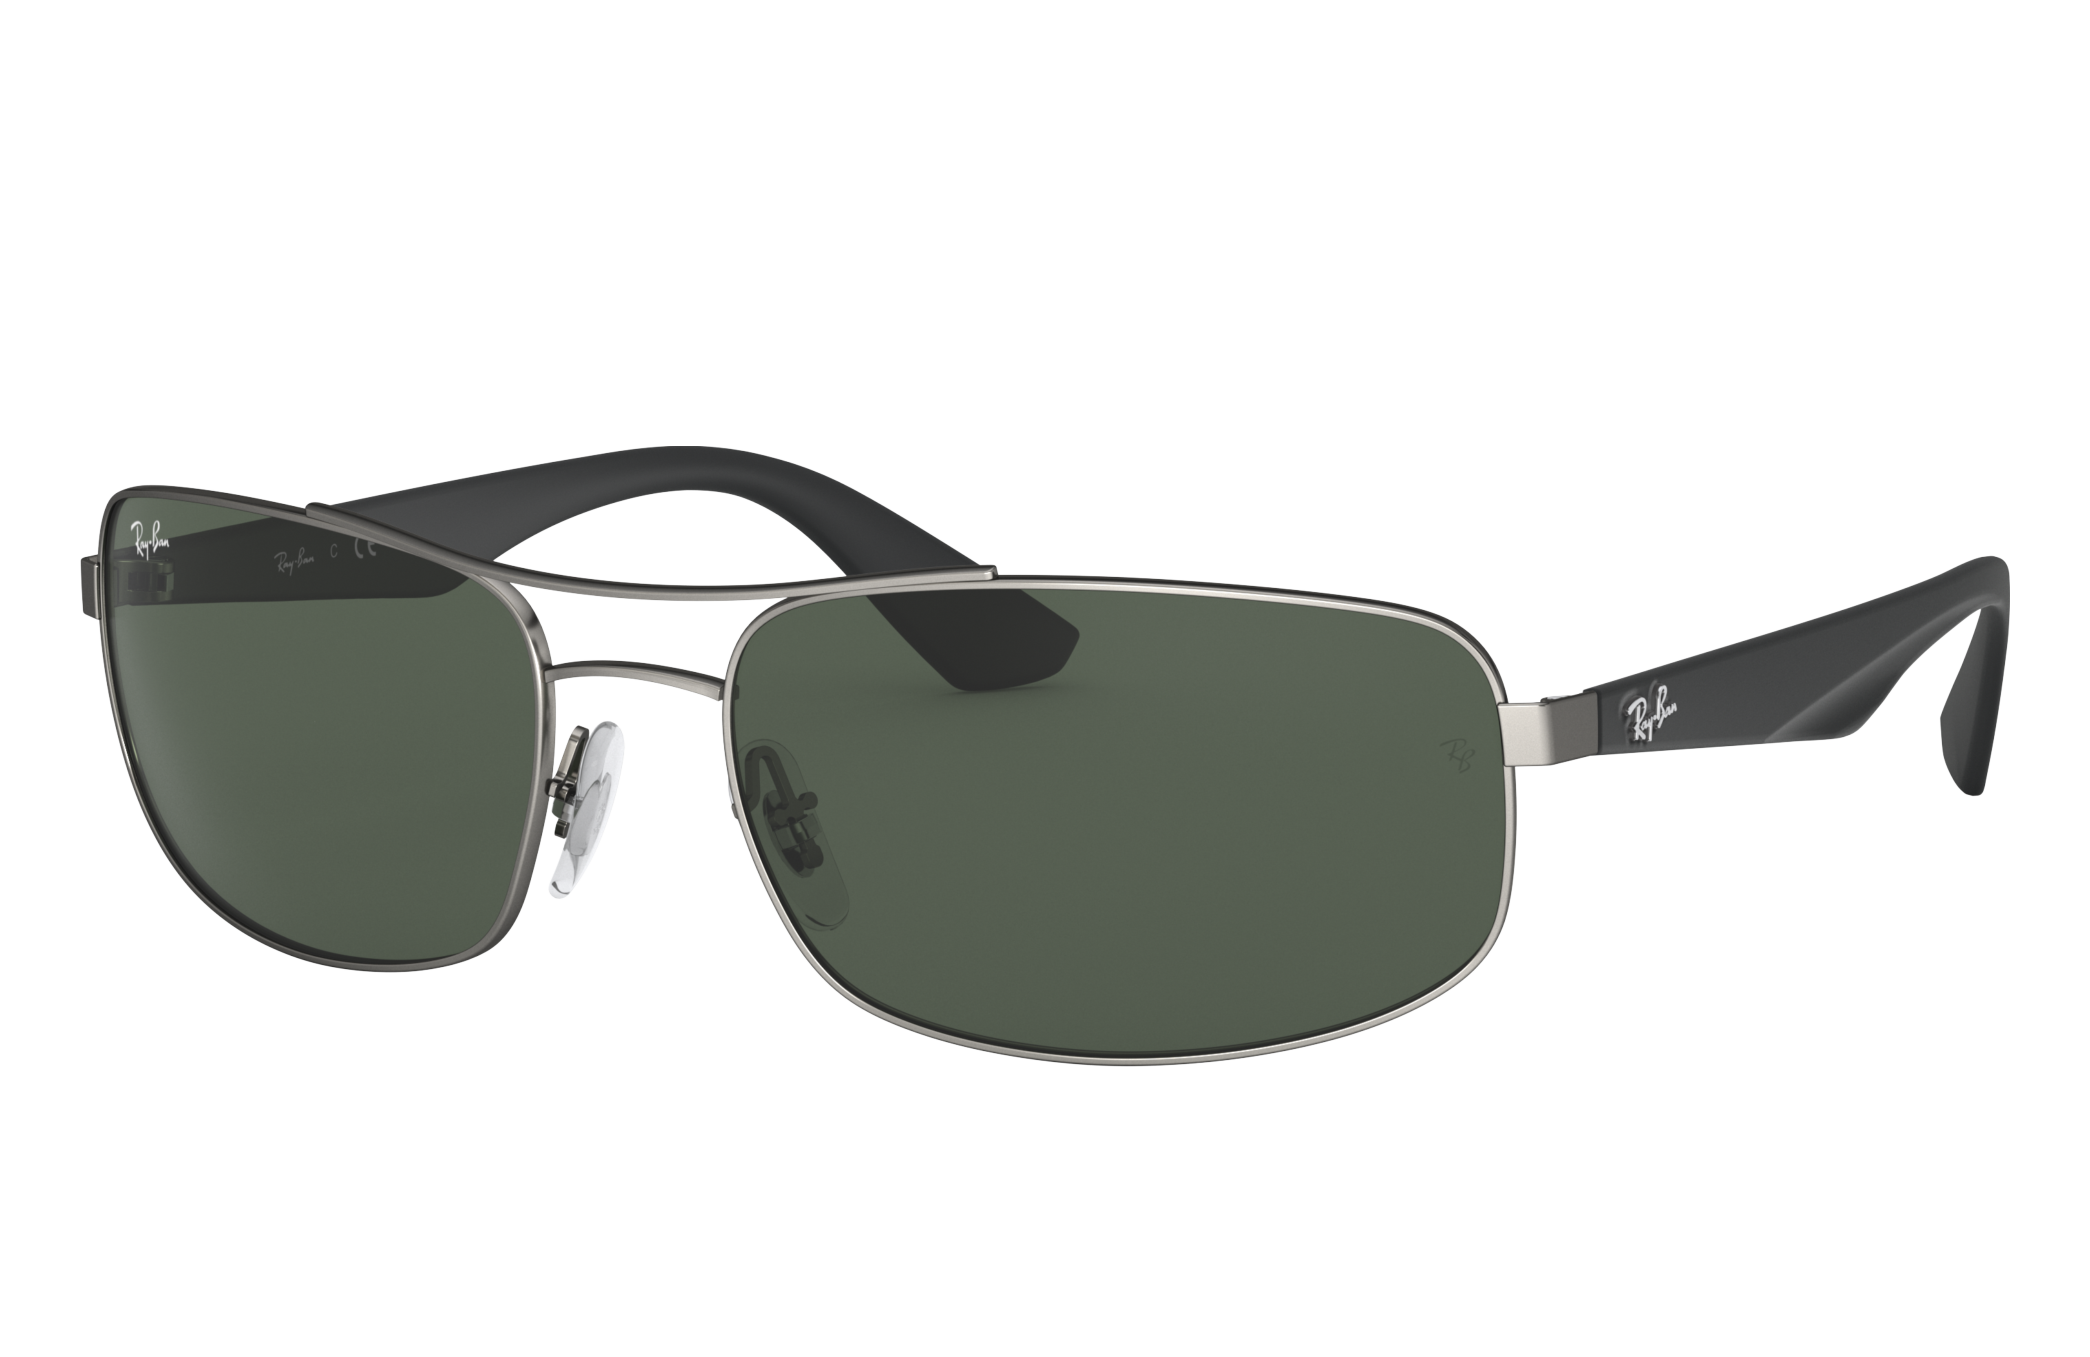 Ray-Ban Rb3527 Black, Green Lenses - RB3527